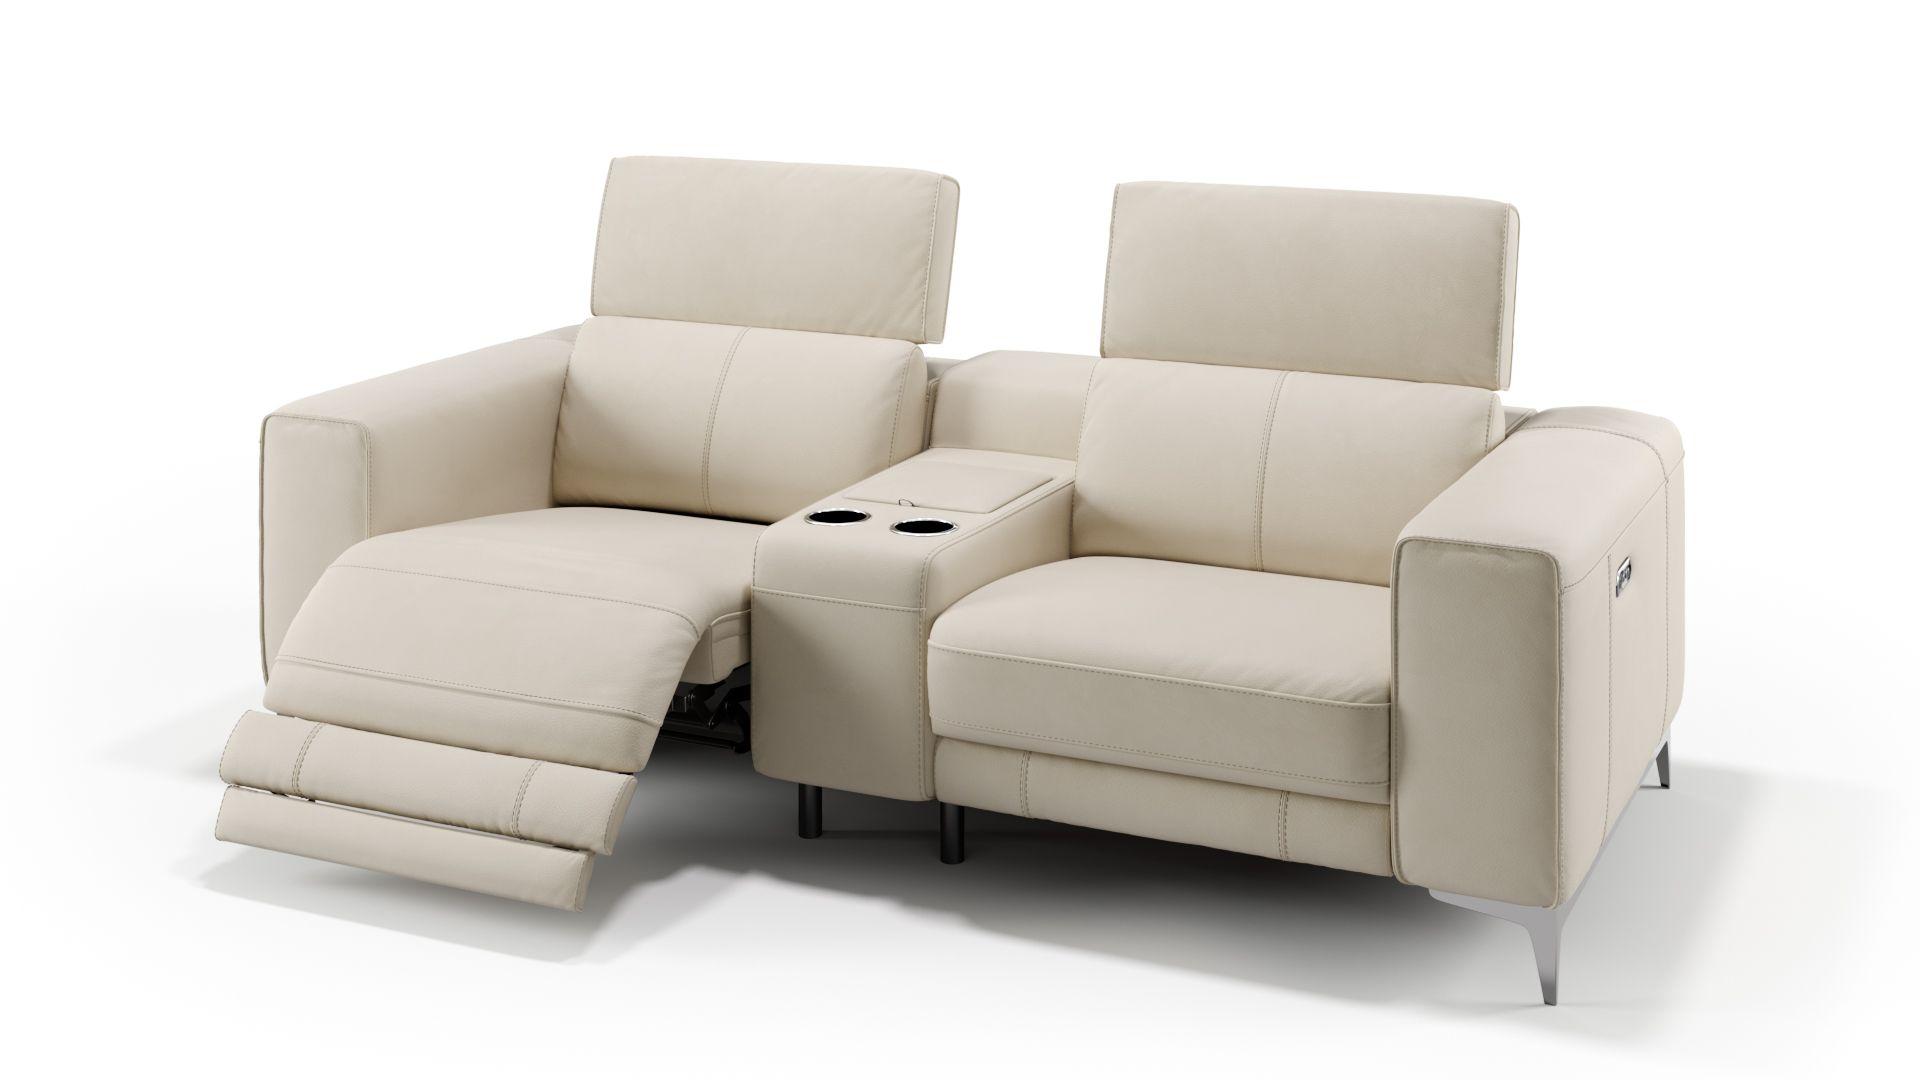 Leder 2-Sitzer Kinosofa + 2x 1-Sitzer CUPELLO